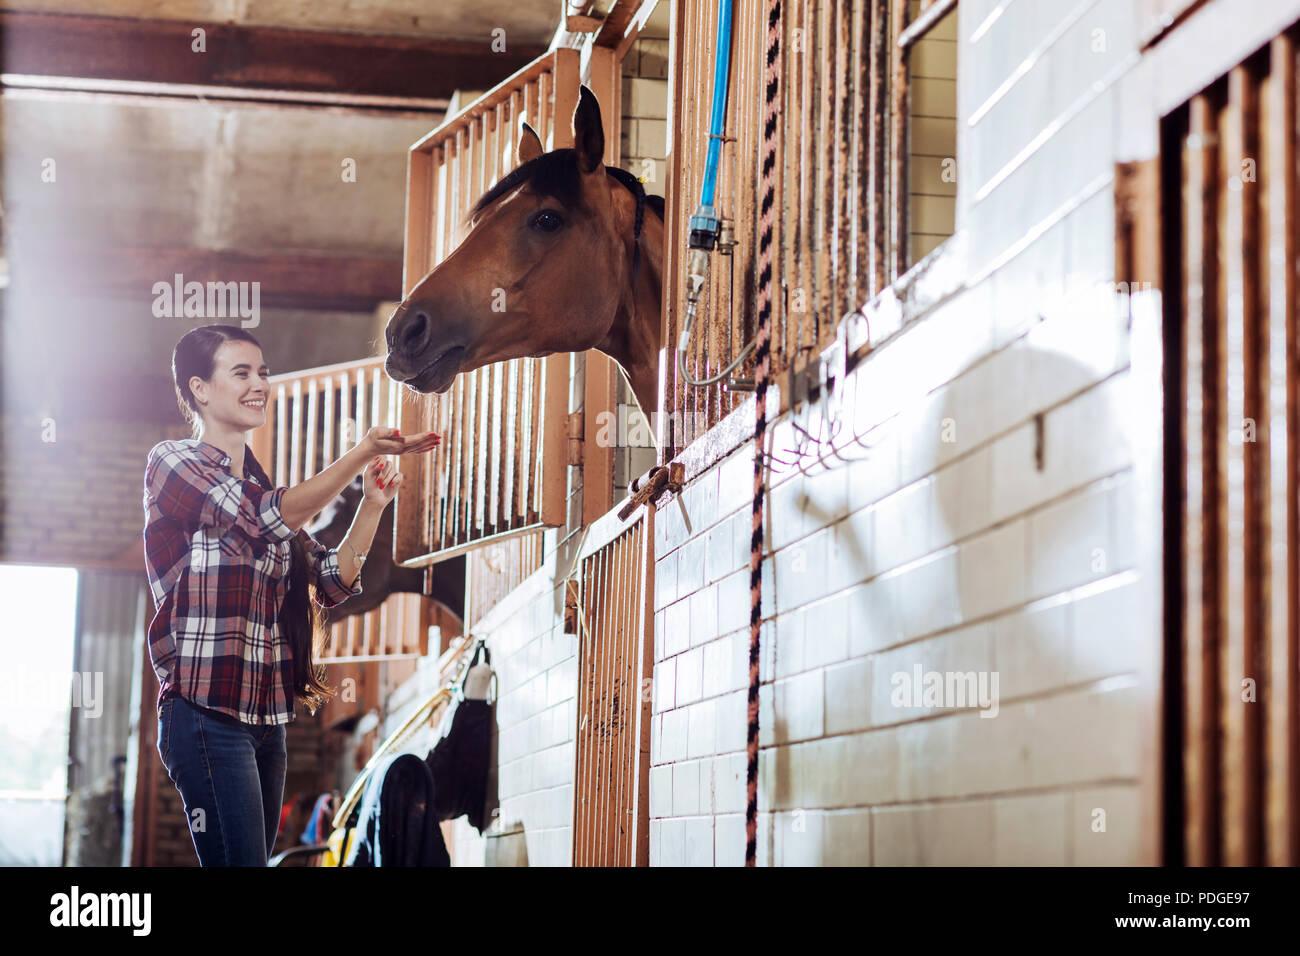 Mujer sentirse entretenido mientras se alimentan hermosa caballo Imagen De Stock